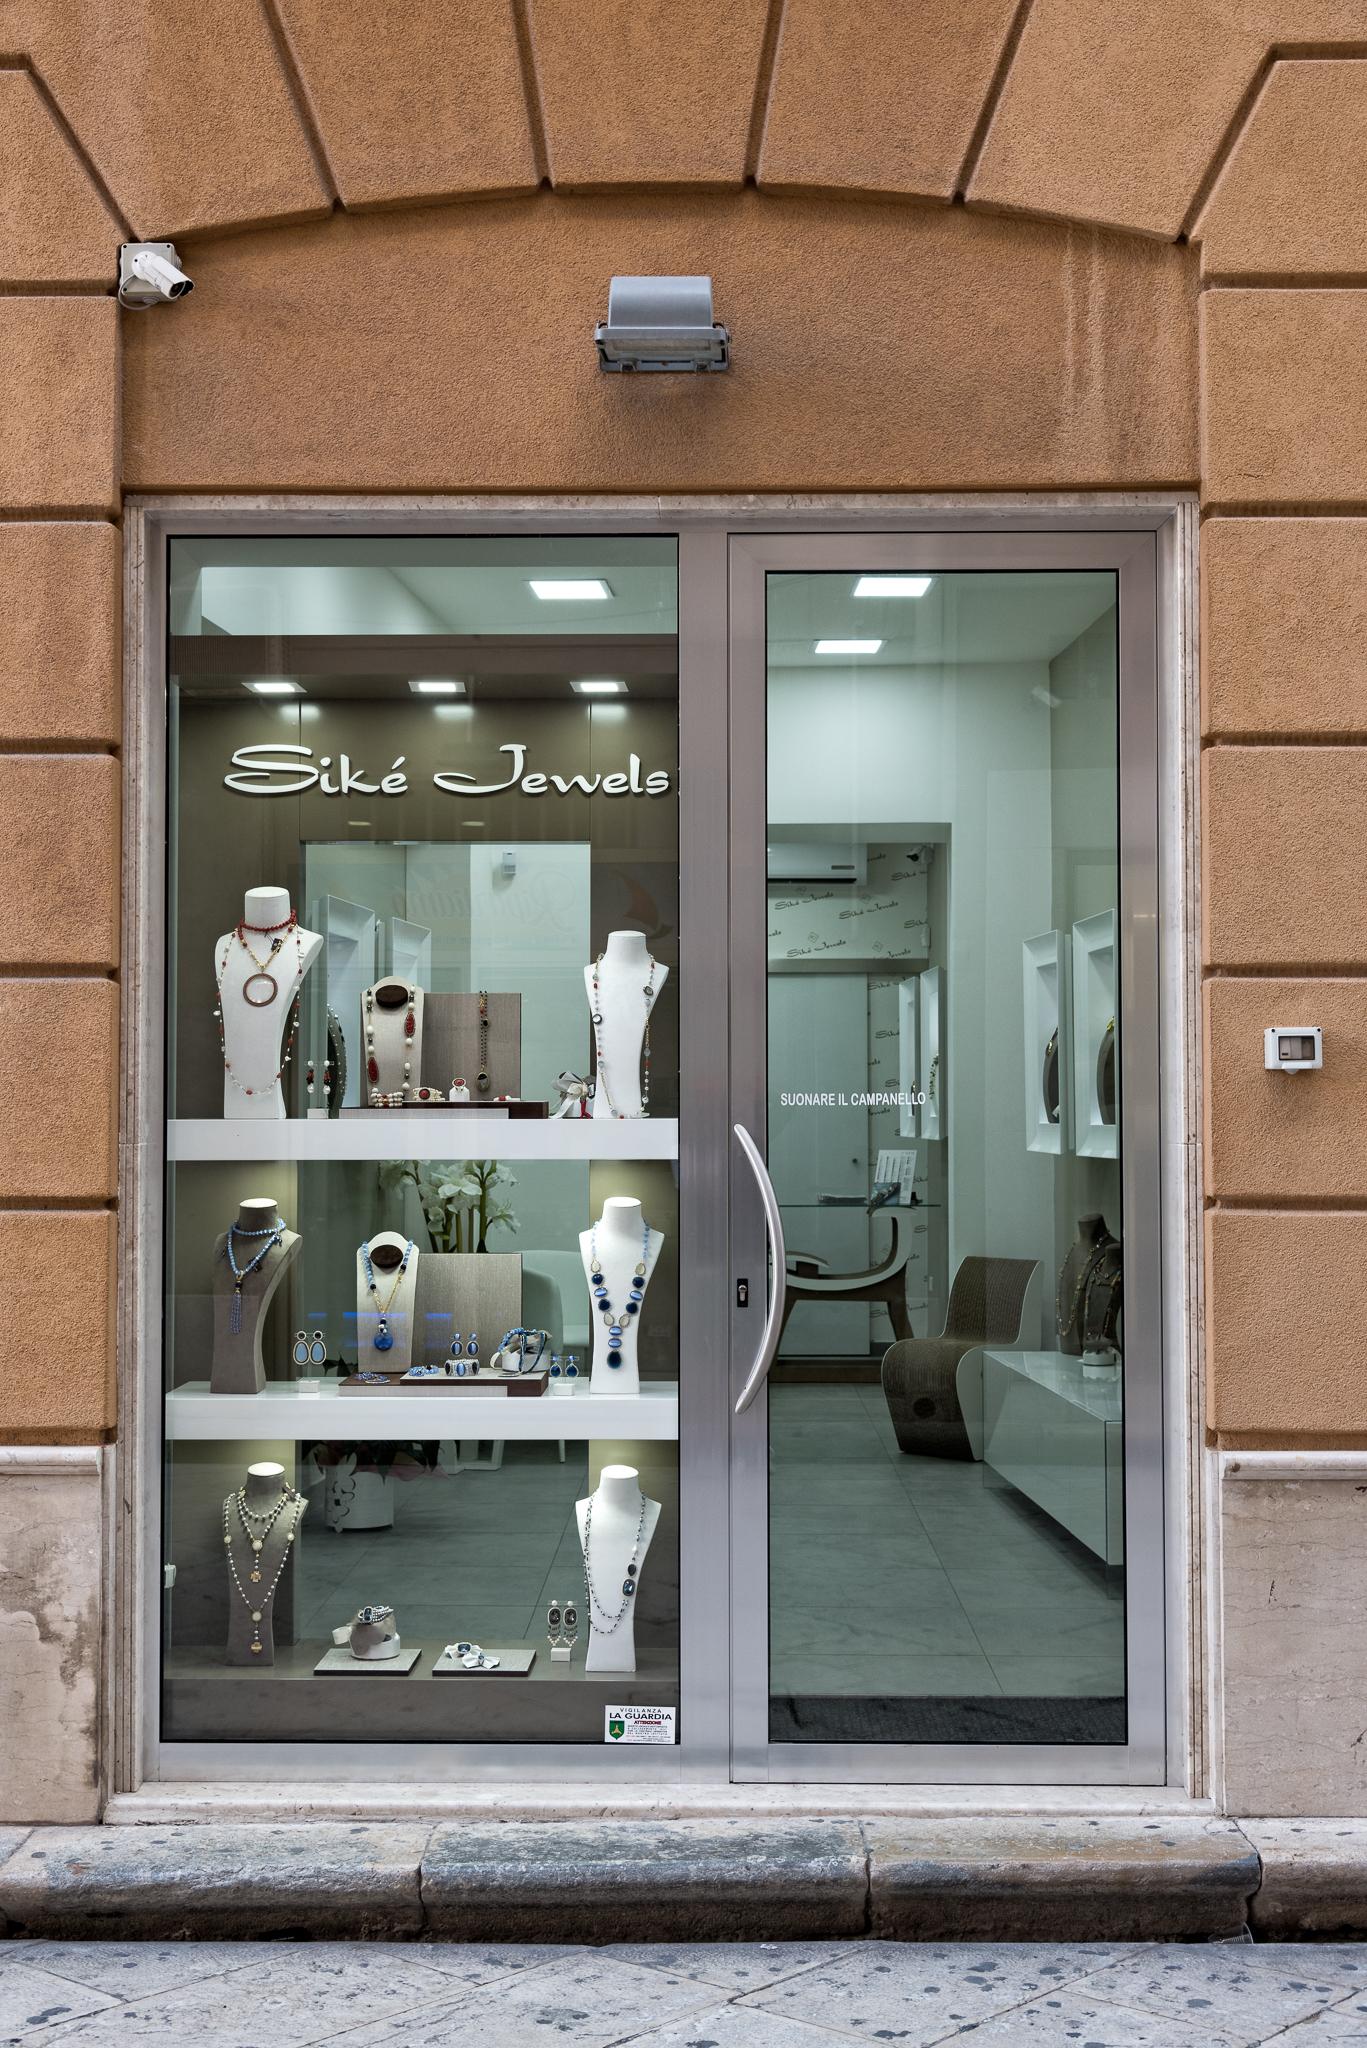 Siké Jewels Entrance